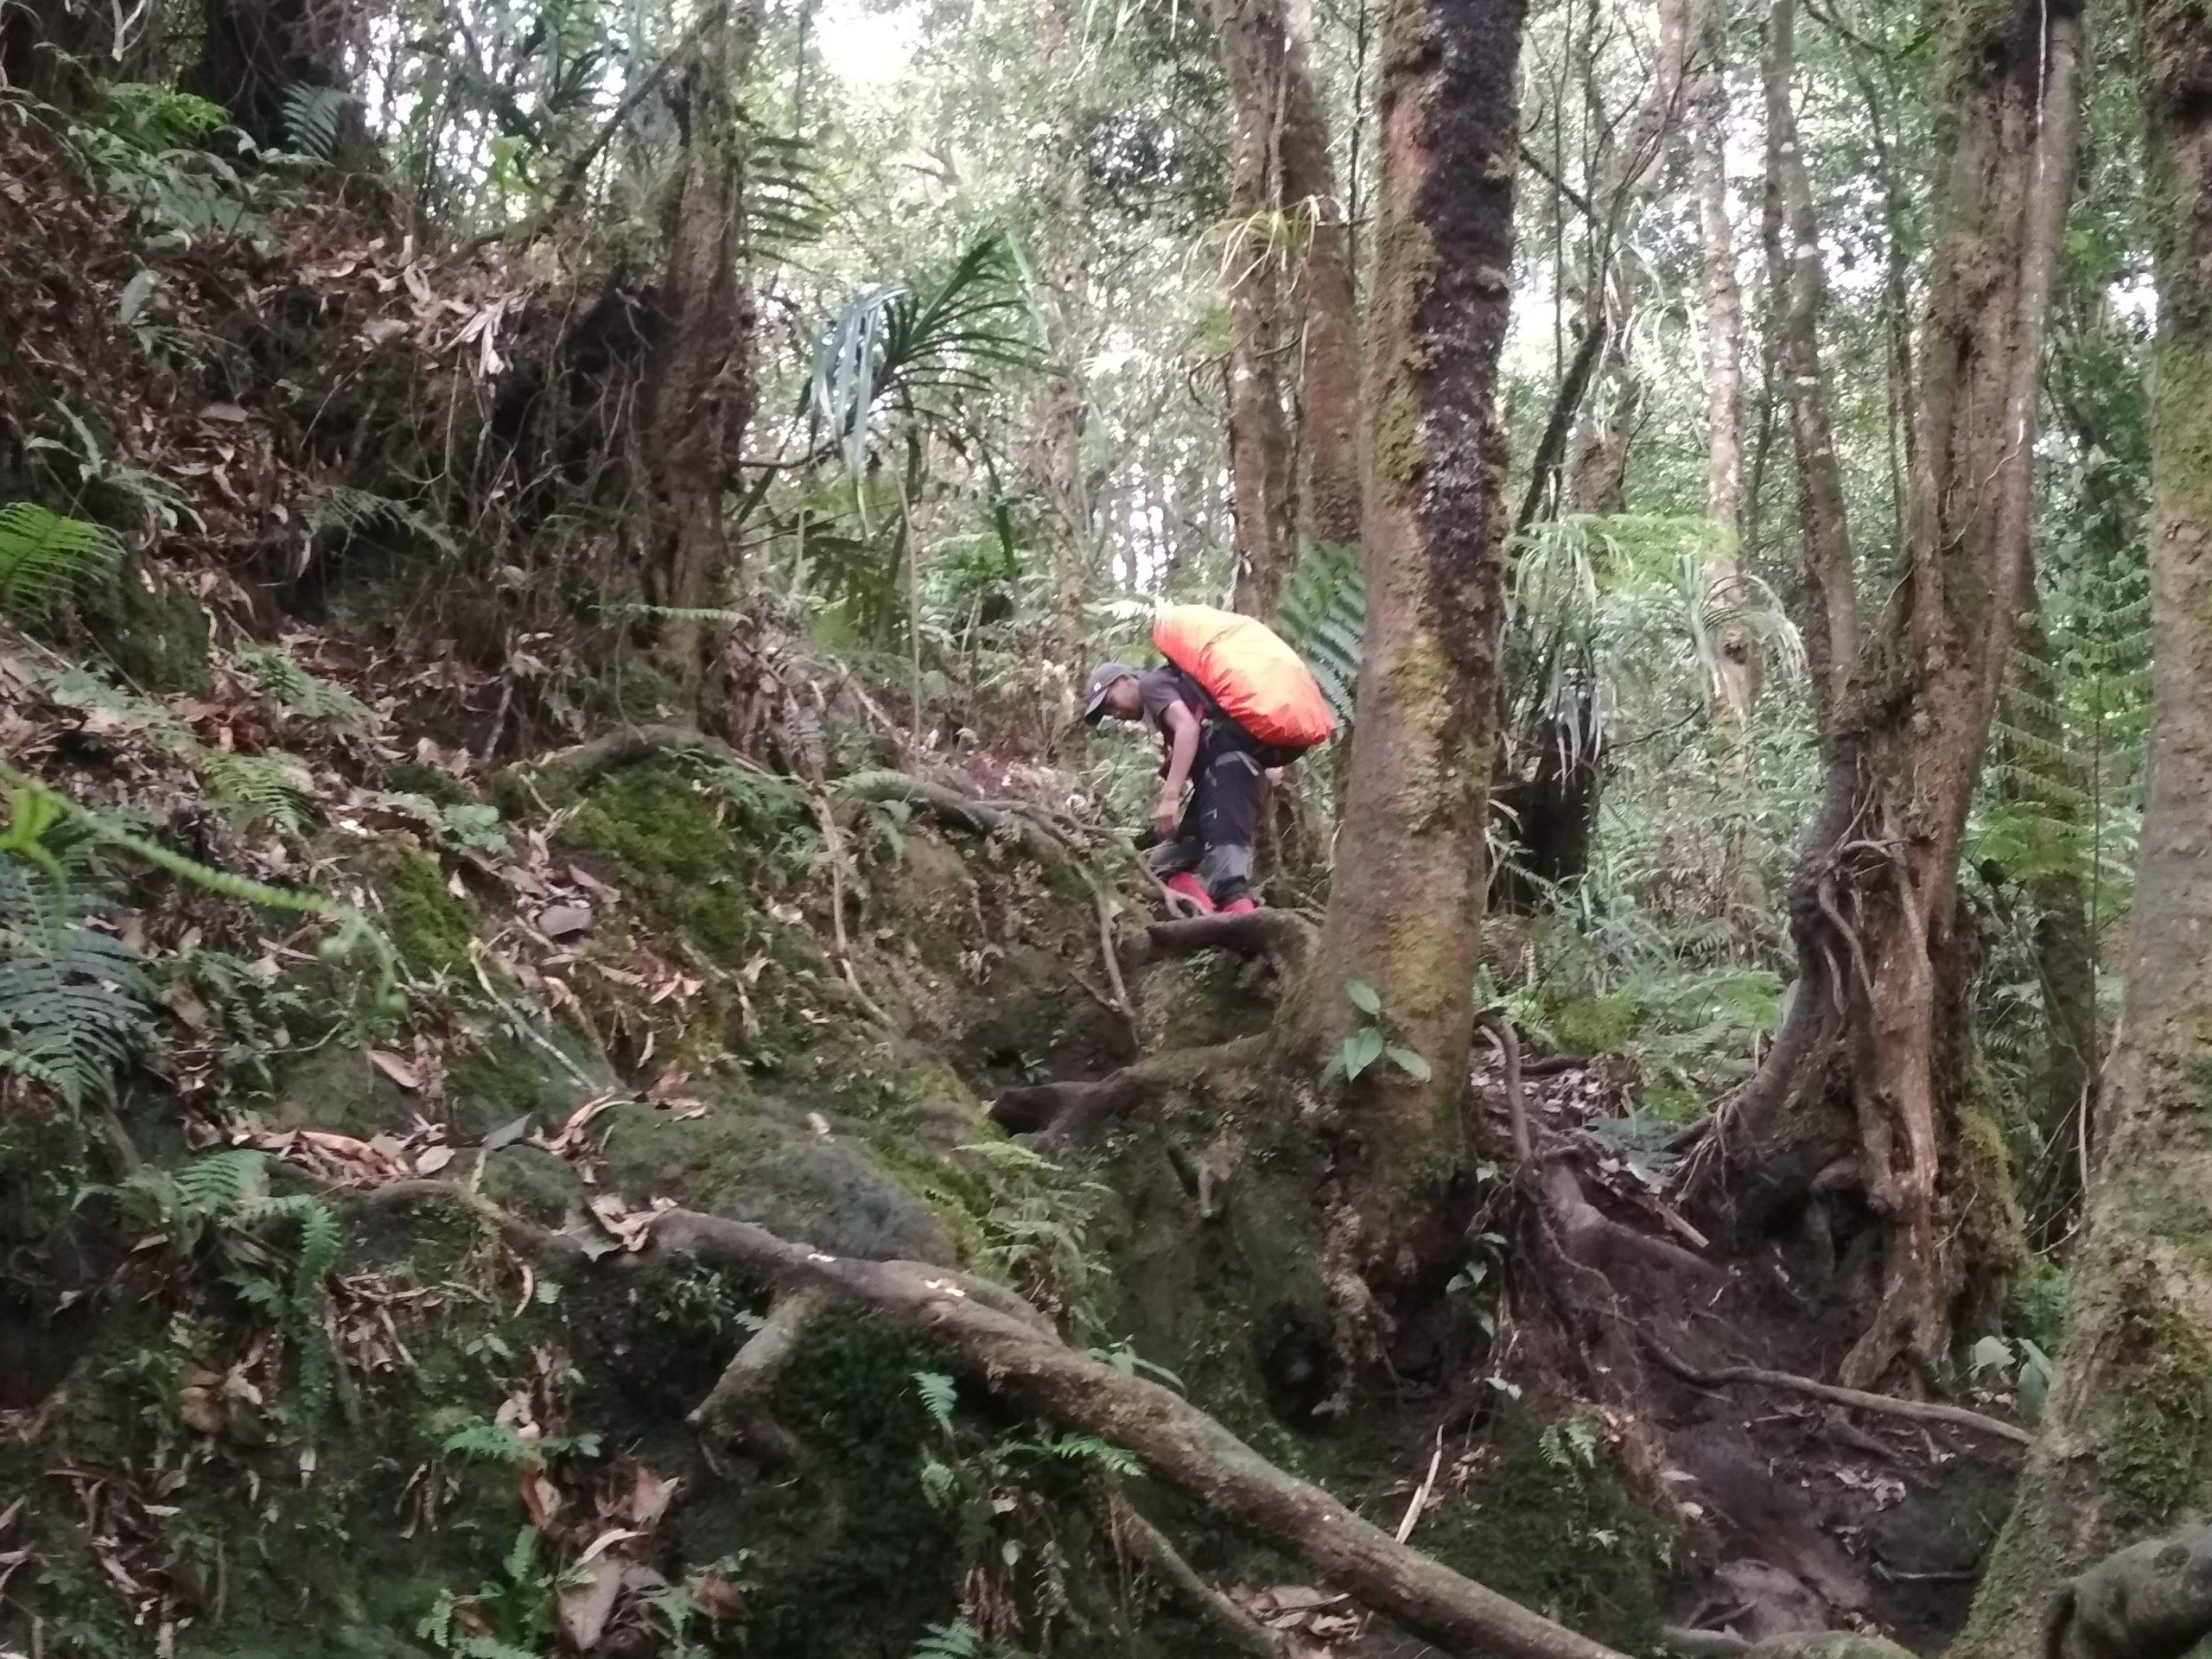 Suasana Jalur Pendakian Puncak Manik atau Salak I, Taman Nasional Gunung Halimun Salak (TNGHS), Jawa Barat